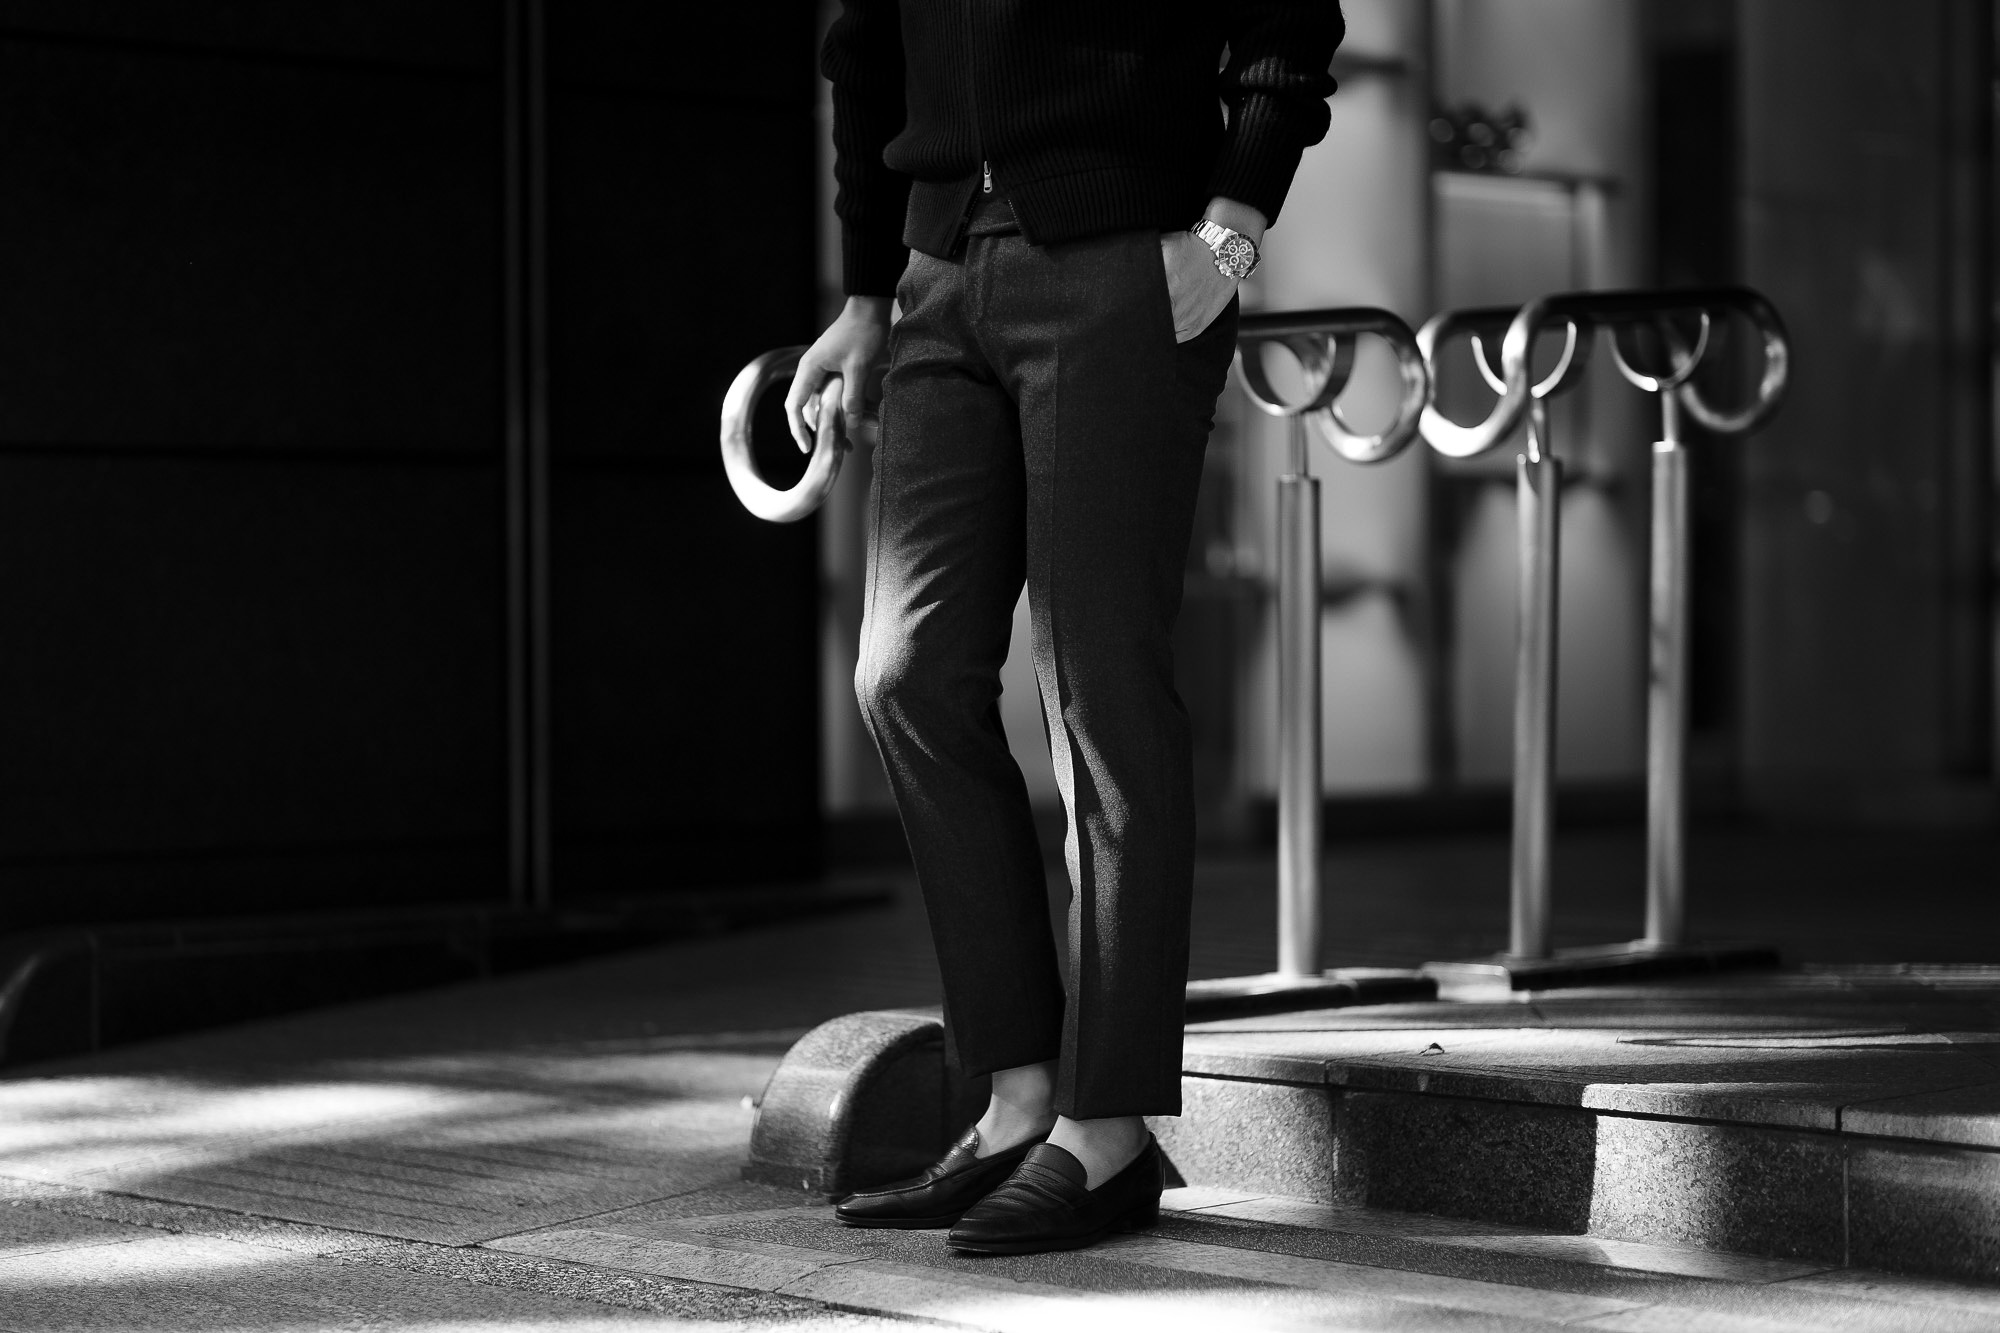 INCOTEX (インコテックス) N35 SLIM FIT (1T0N35) SUPER 100'S WOOLLEN TWILL サージウール スラックス CHARCOAL GRAY (チャコールグレー・930) 2020 秋冬 【ご予約受付中】愛知 名古屋 altoediritto アルトエデリット